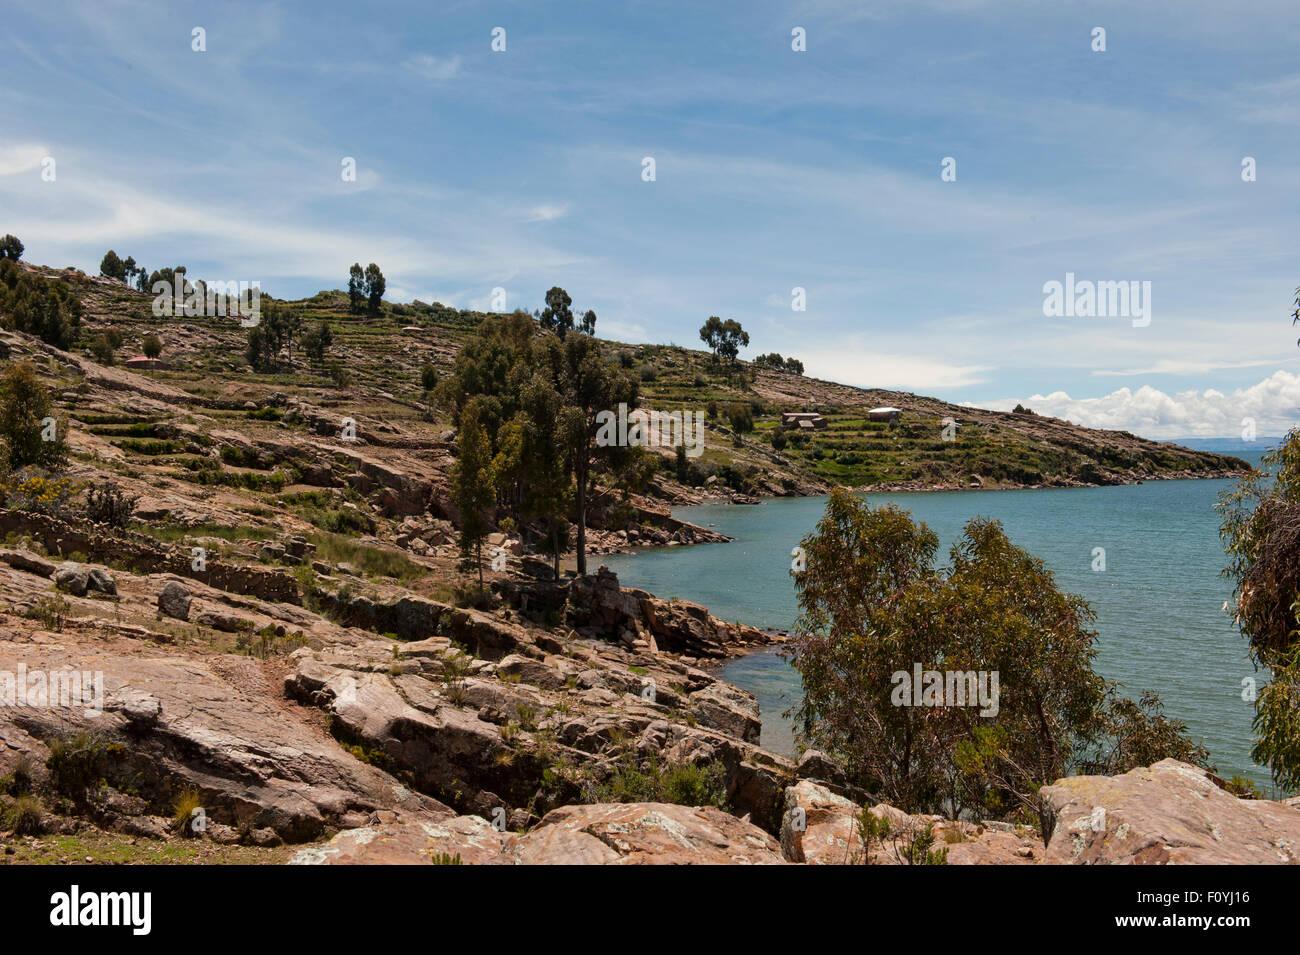 Taquile Island - Stock Image